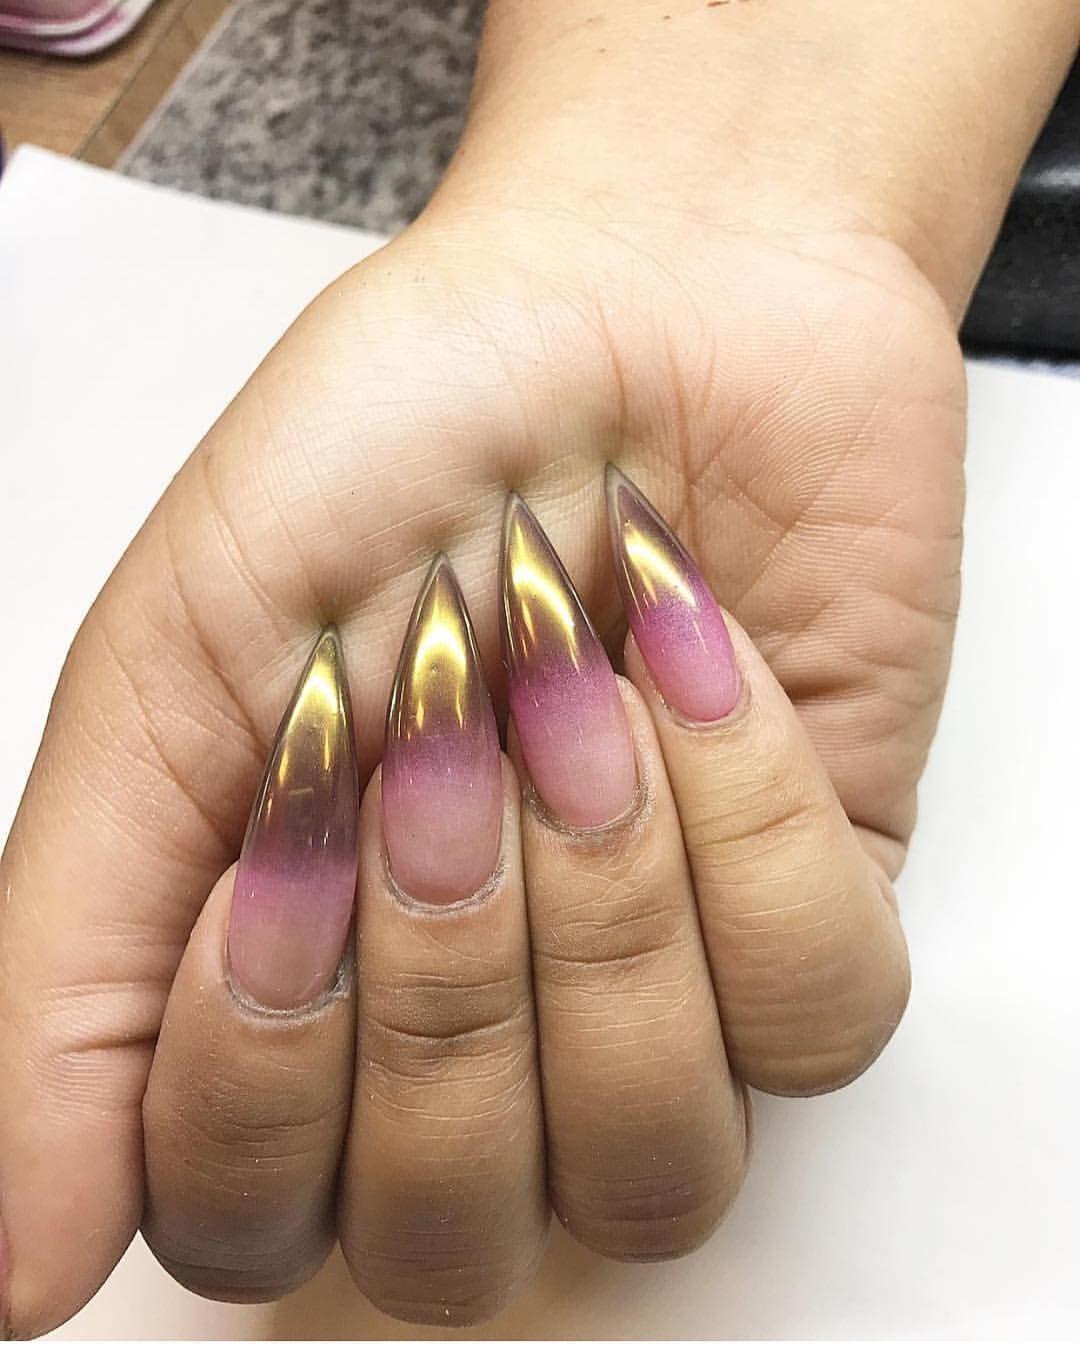 ♚Mαjeѕту❥ | Stilettos | Pinterest | Uña decoradas, Diseños de uñas ...